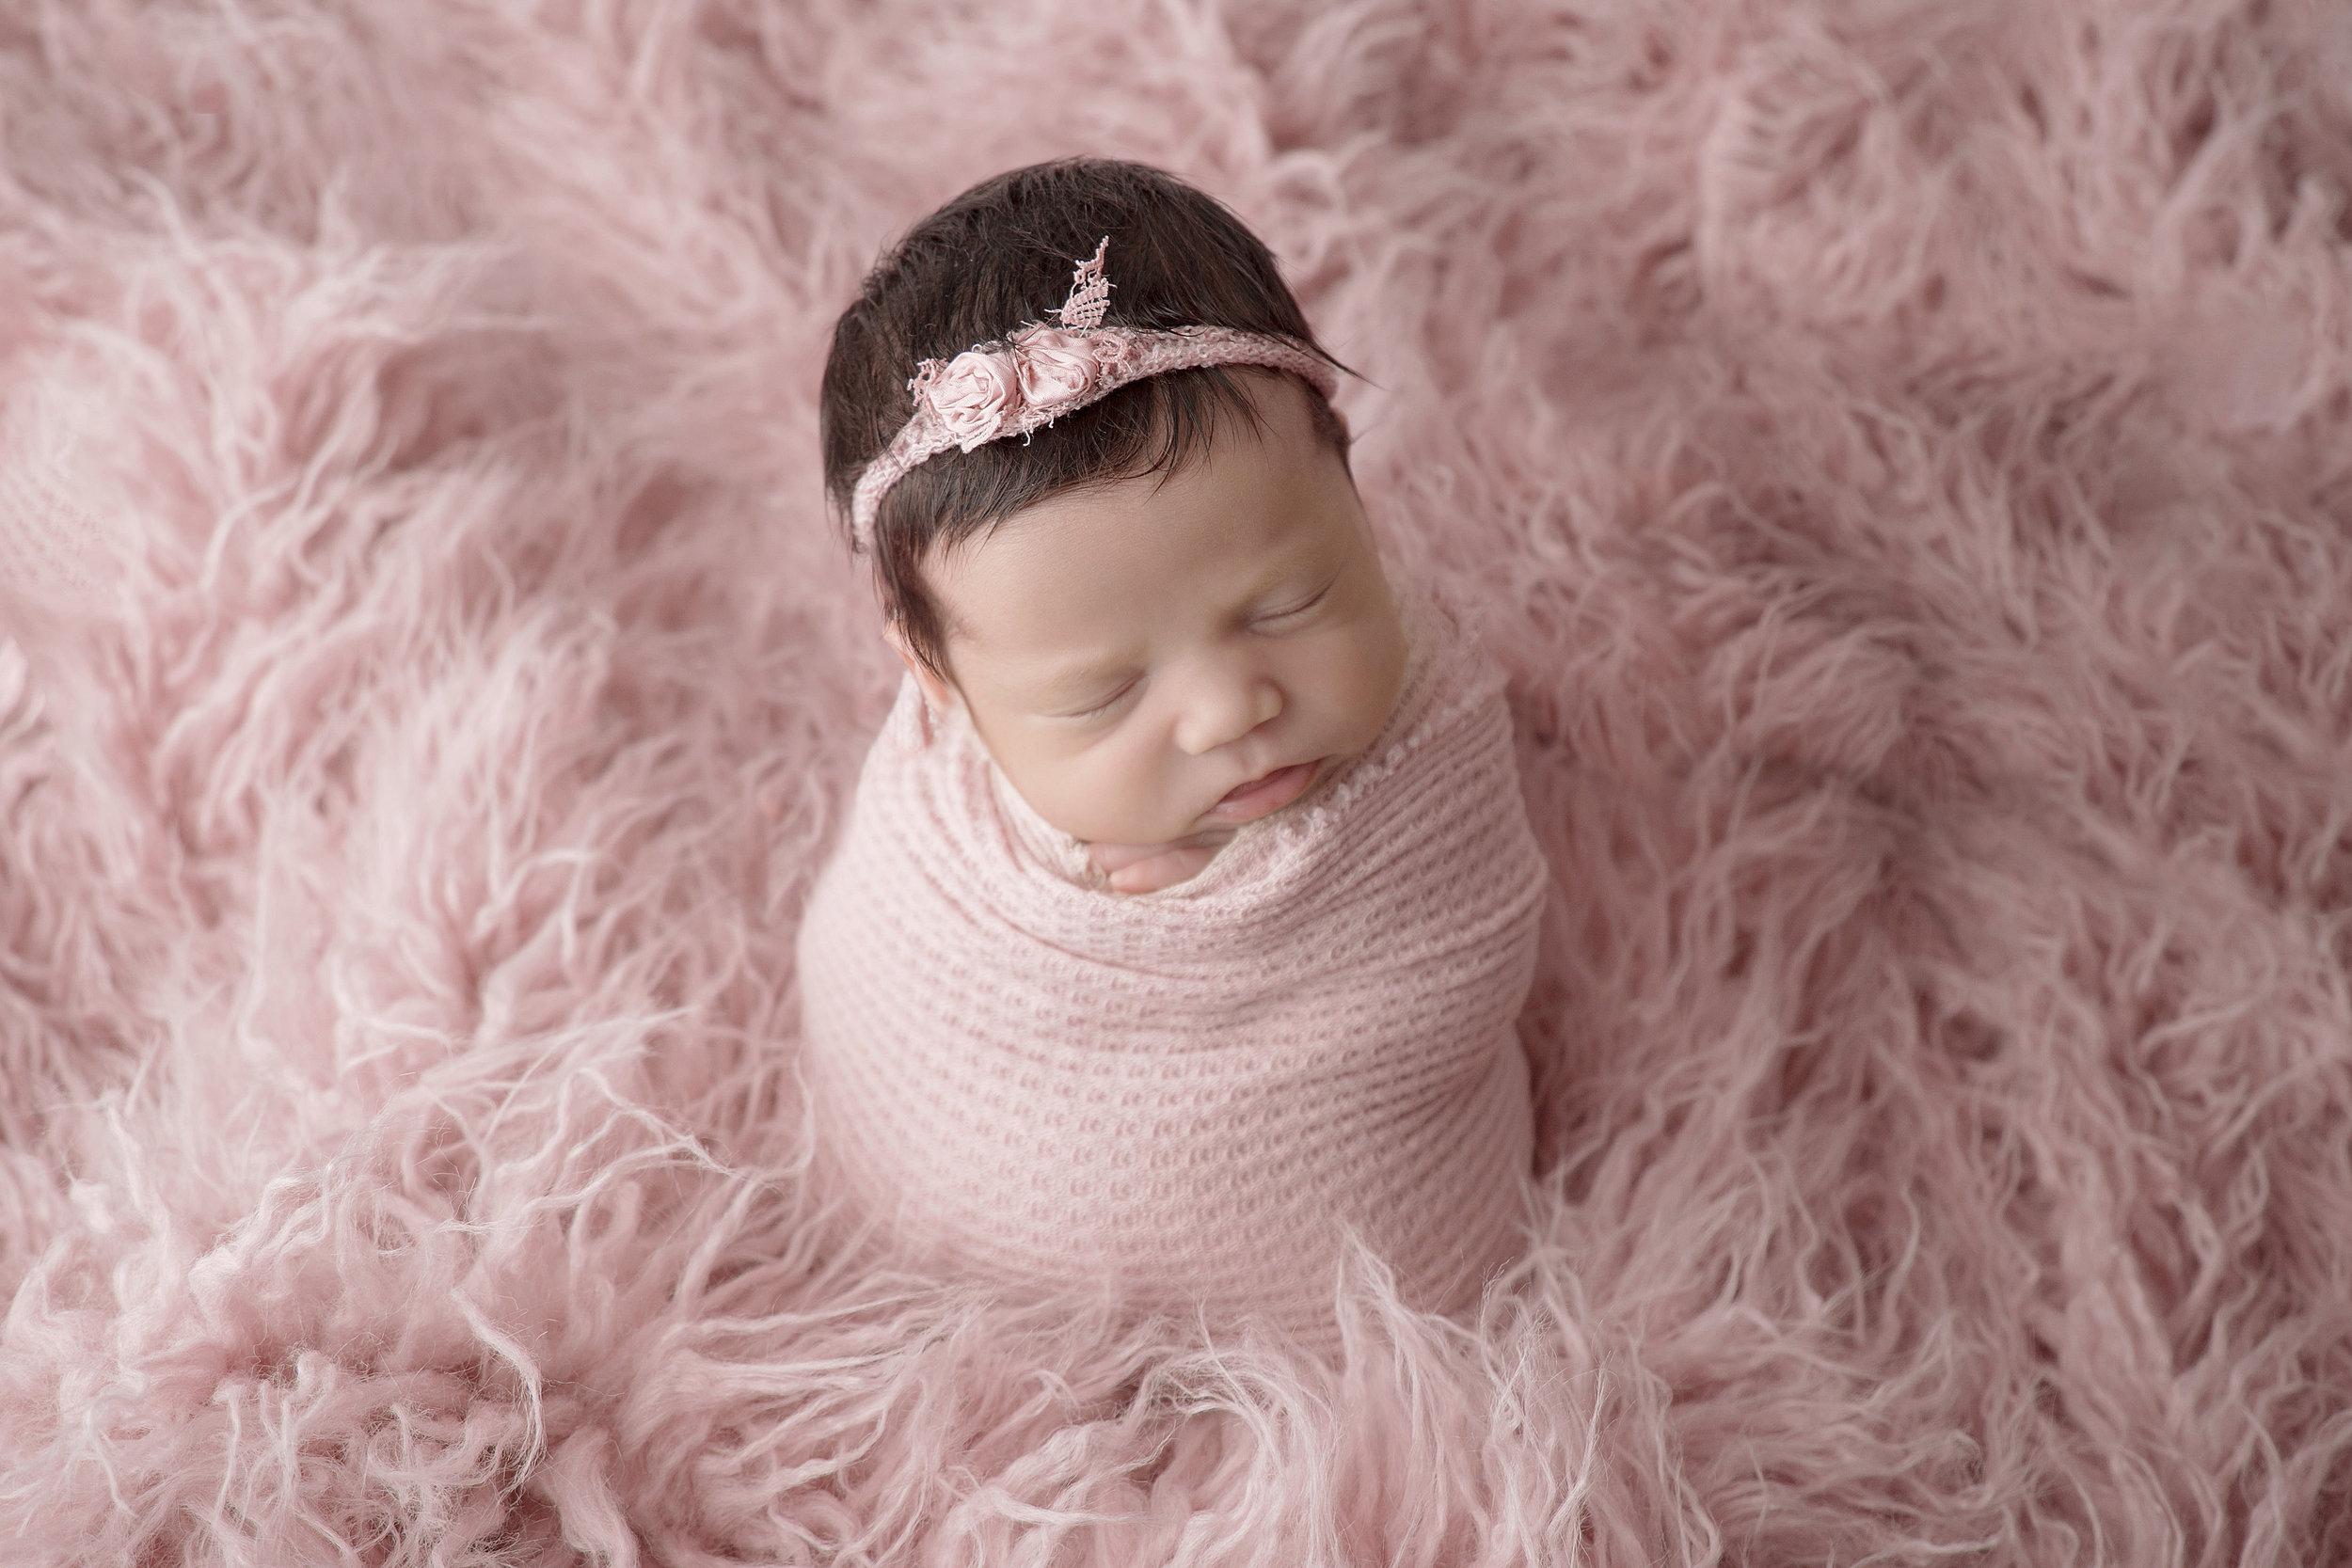 lancaster-newborn-photography-angie-englerth-aep007.jpg